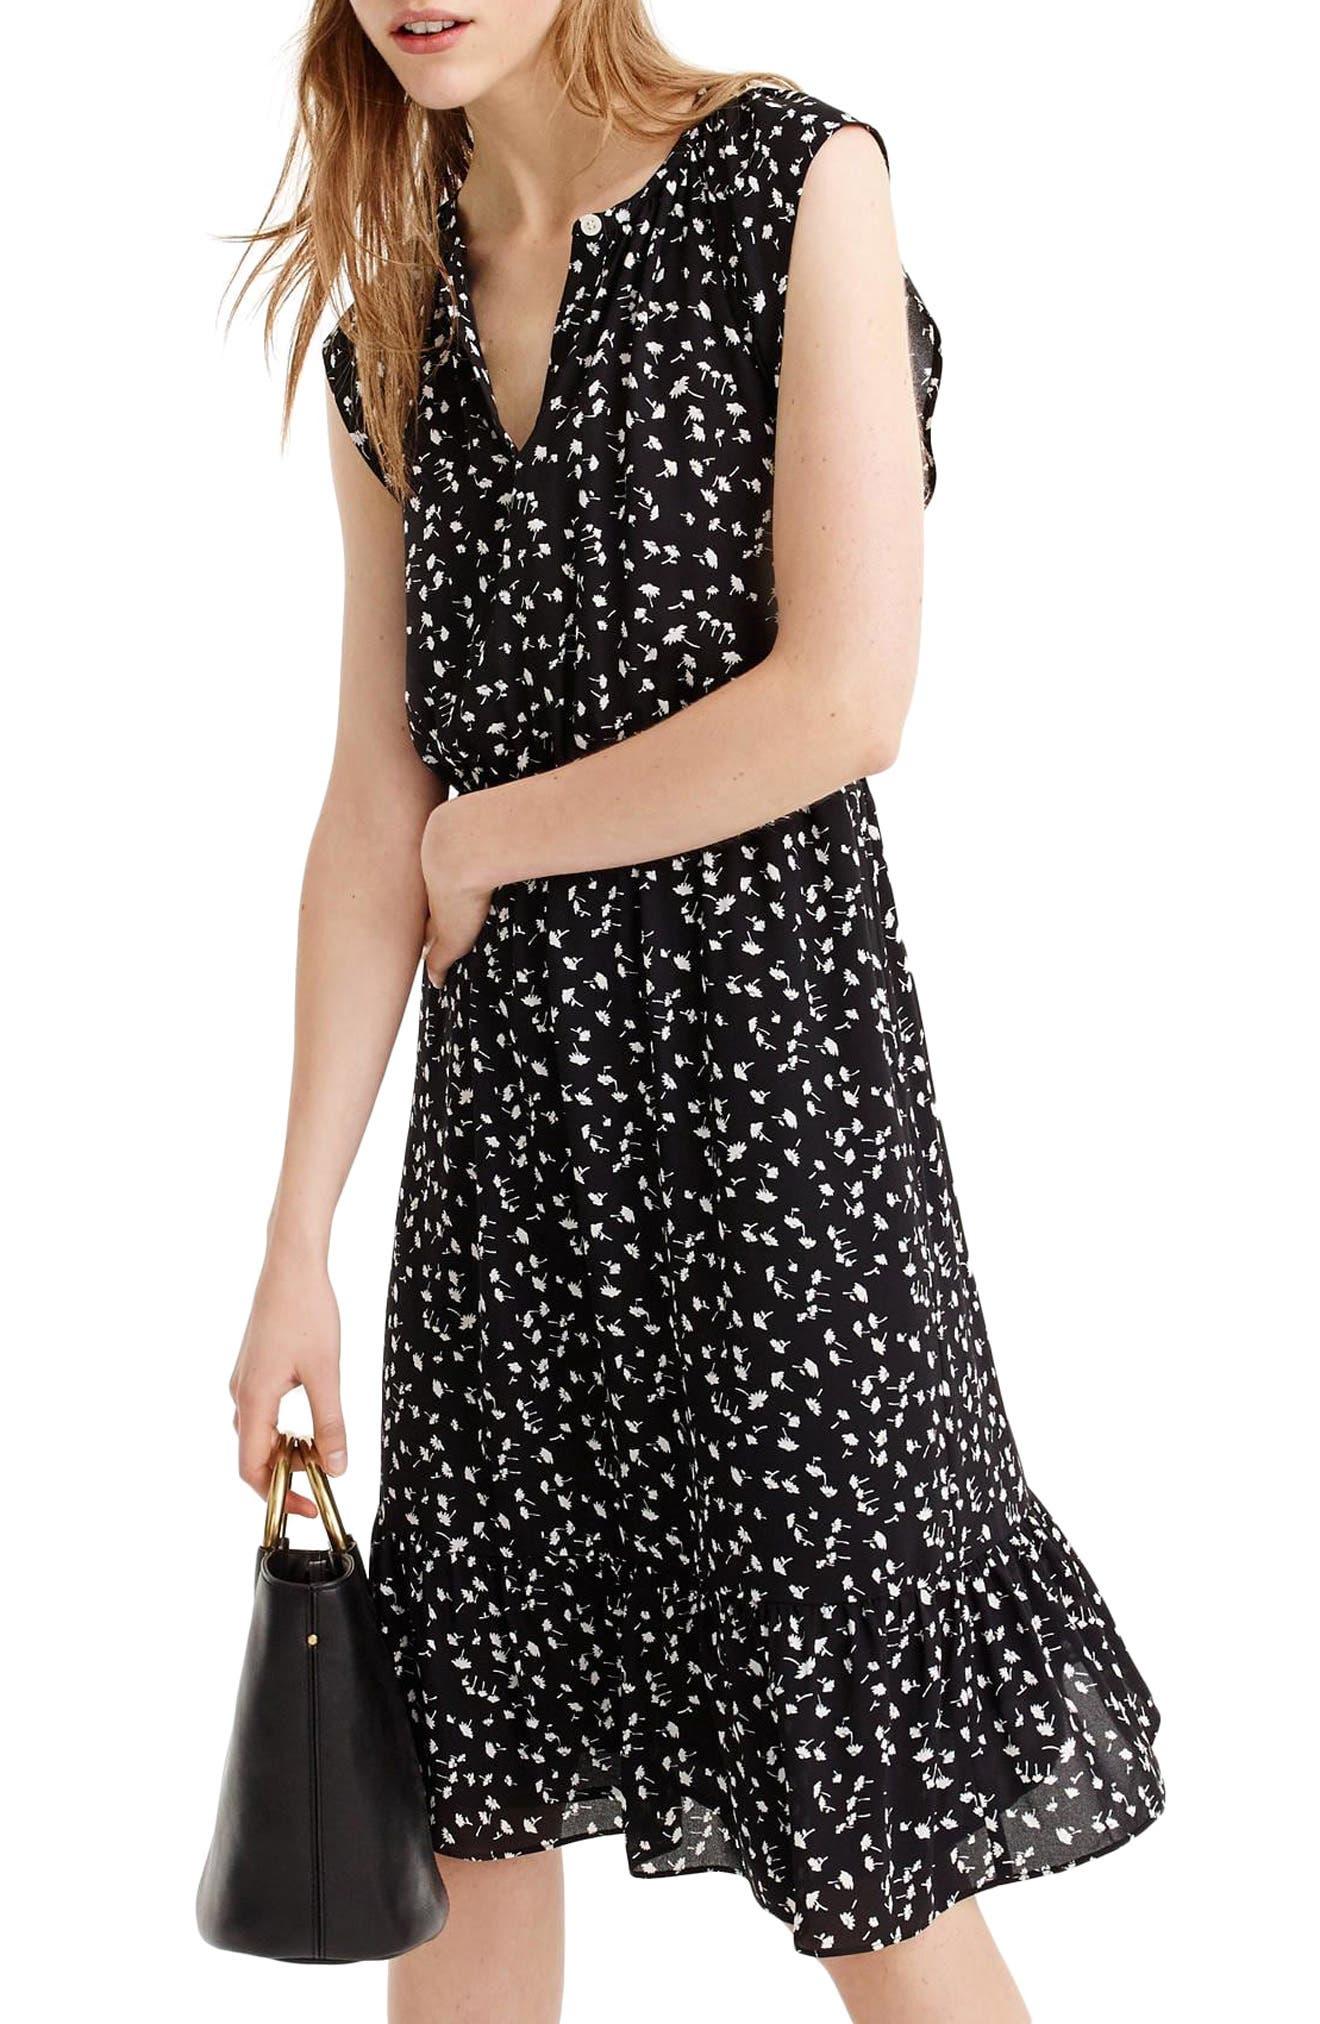 Daisy Floral Cap Sleeve Midi Dress,                             Main thumbnail 1, color,                             Black Ivory